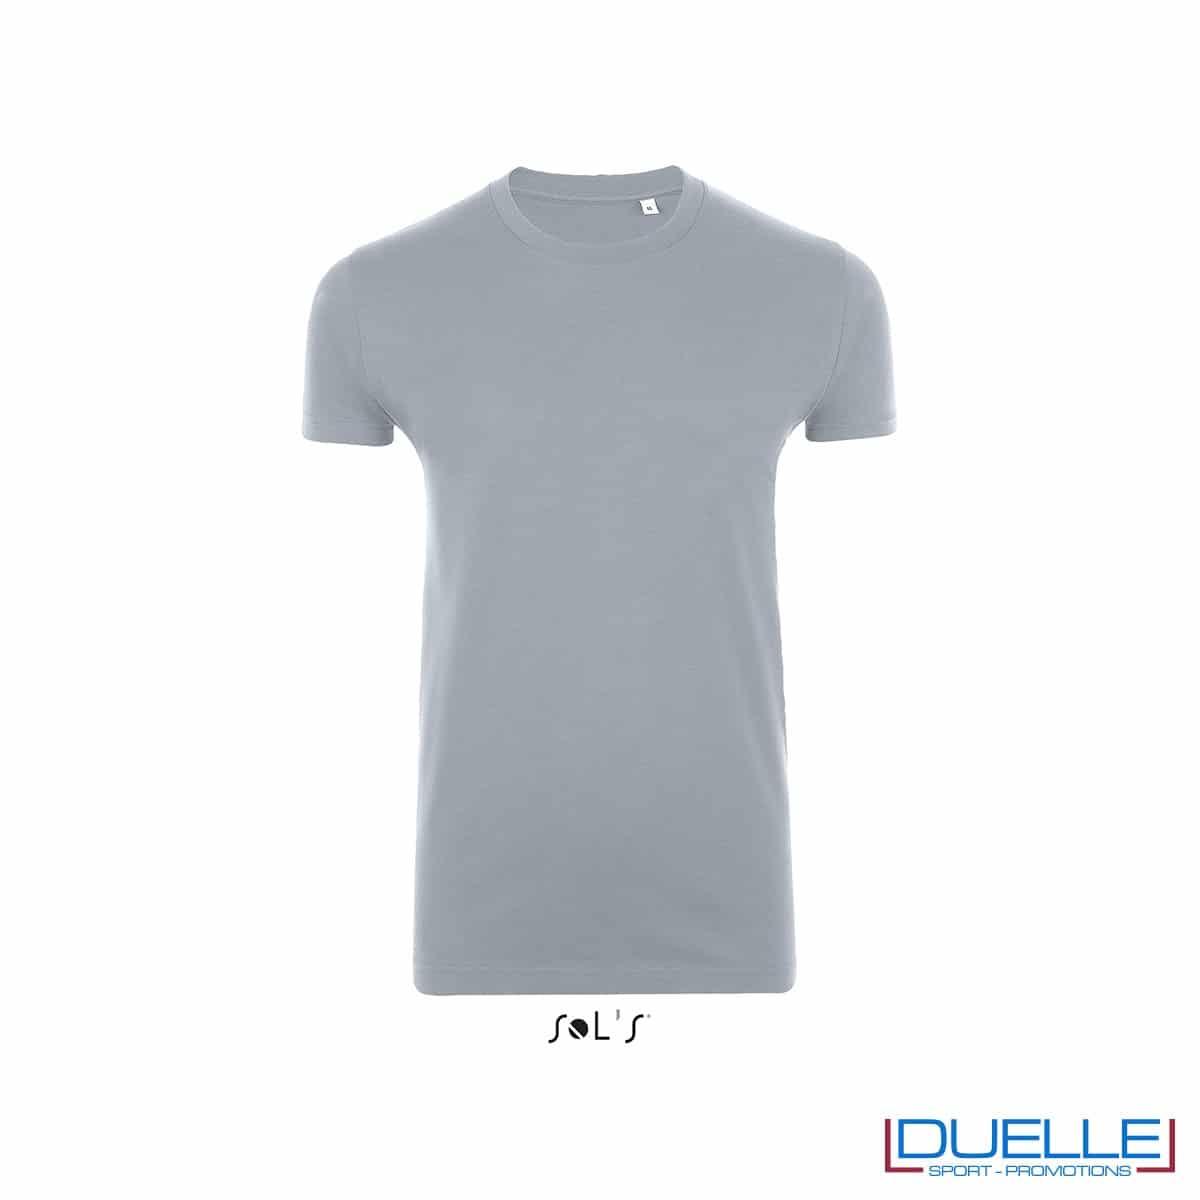 T-shirt slim fit in cotone pesante colore grigio